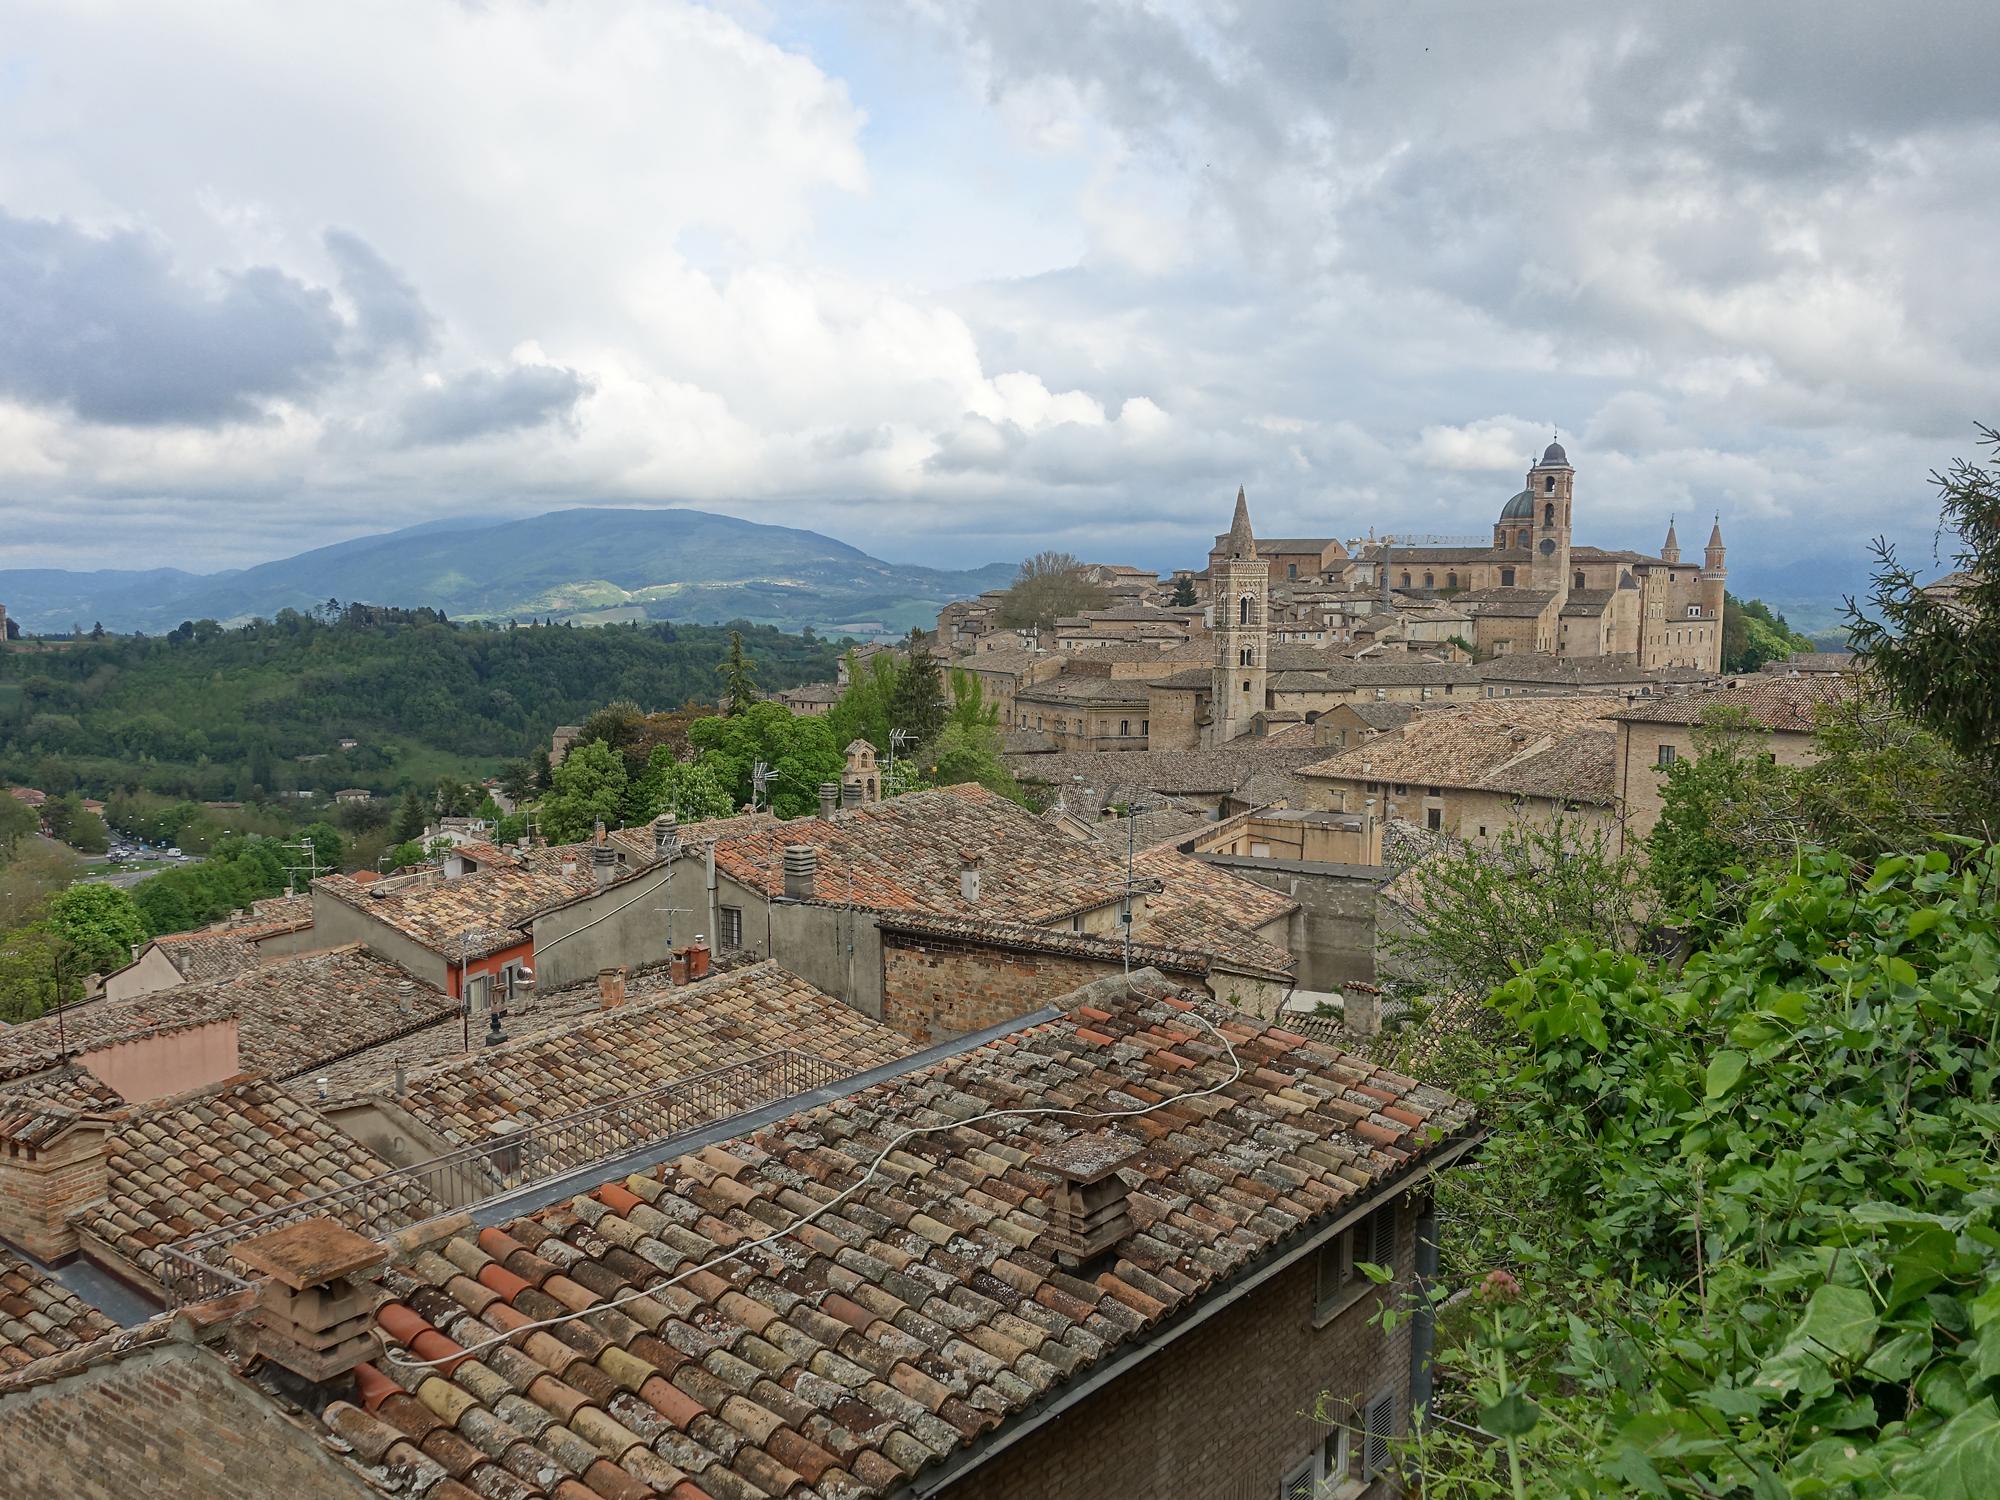 Italien (Gardasee, Venetien, Emilia-Romagna, Marken) - 01.04.-02.05.2019